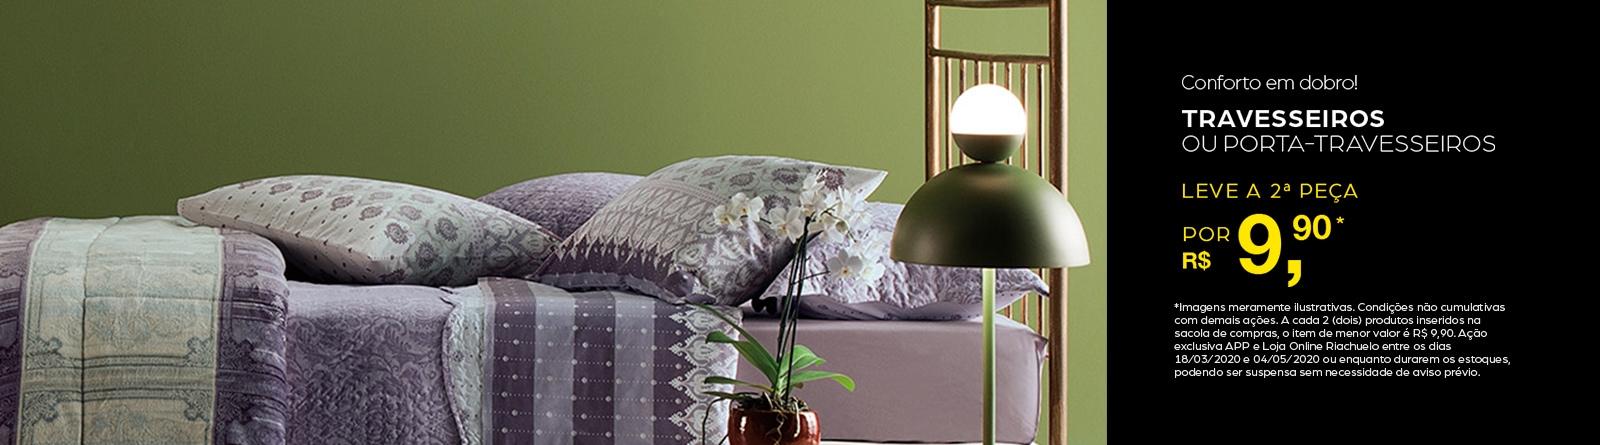 Riachuelo - Moda Casa travesseiros